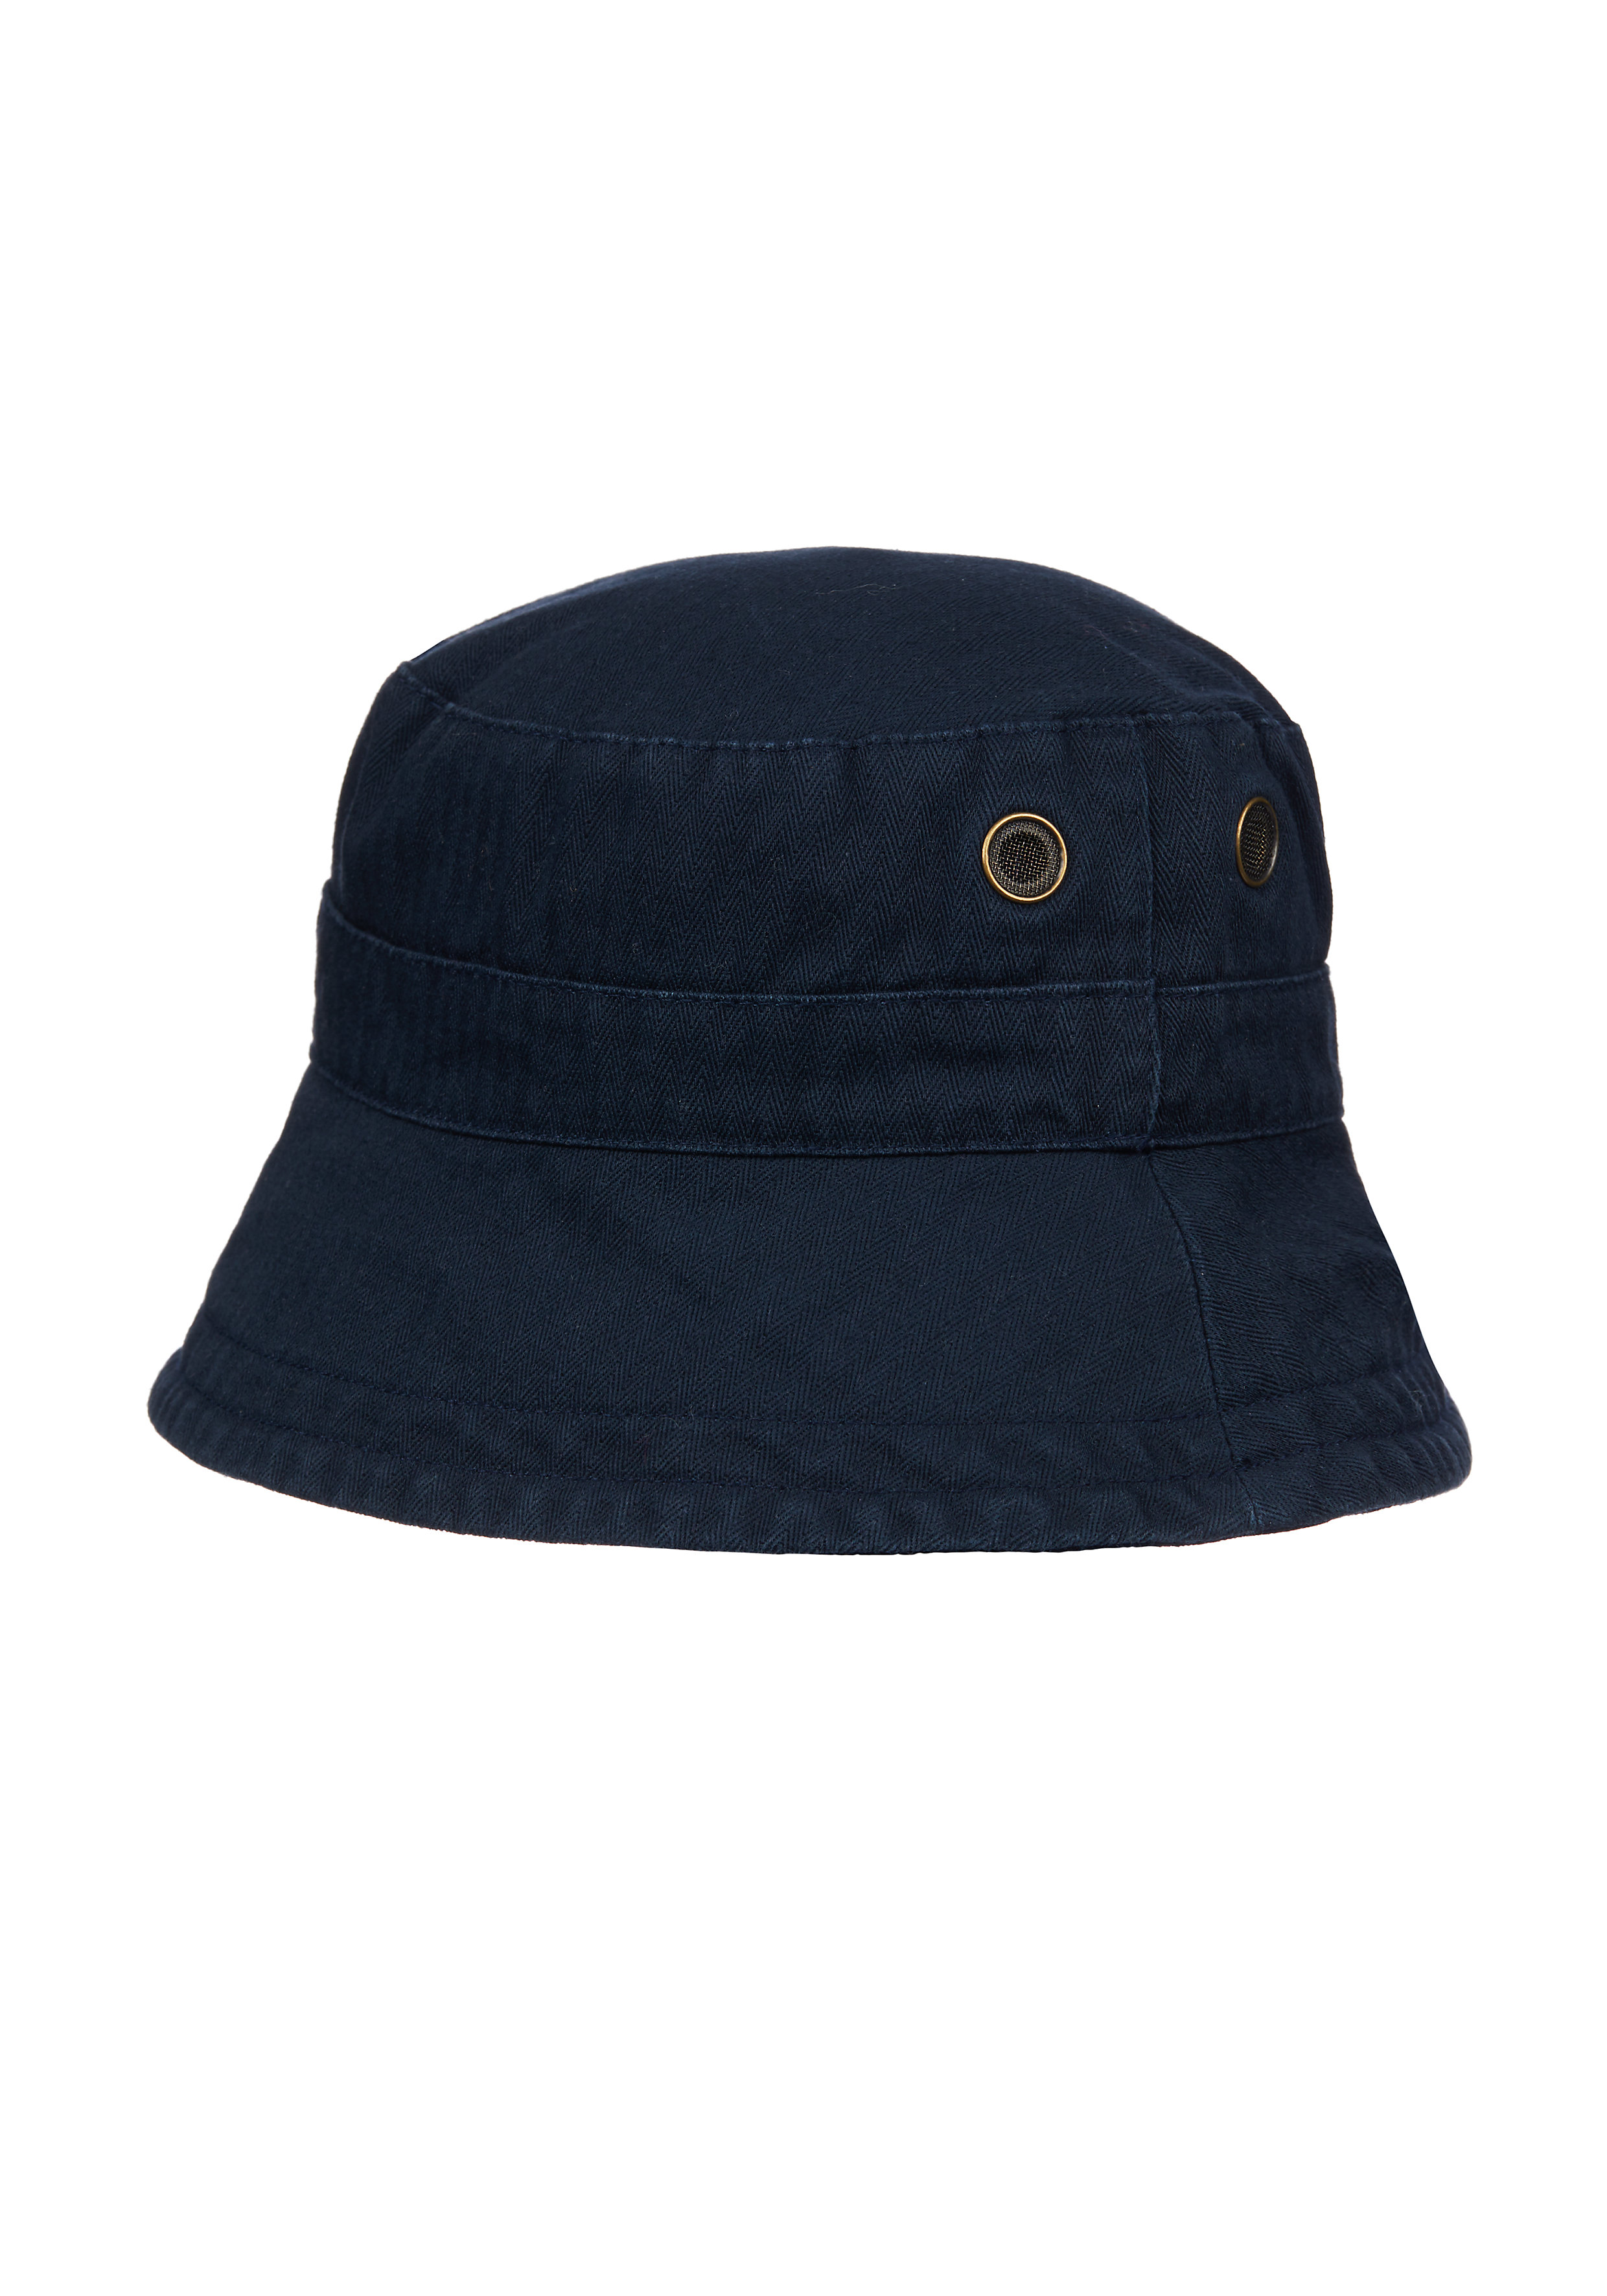 Mothercare | Boys Sun Hat - Navy